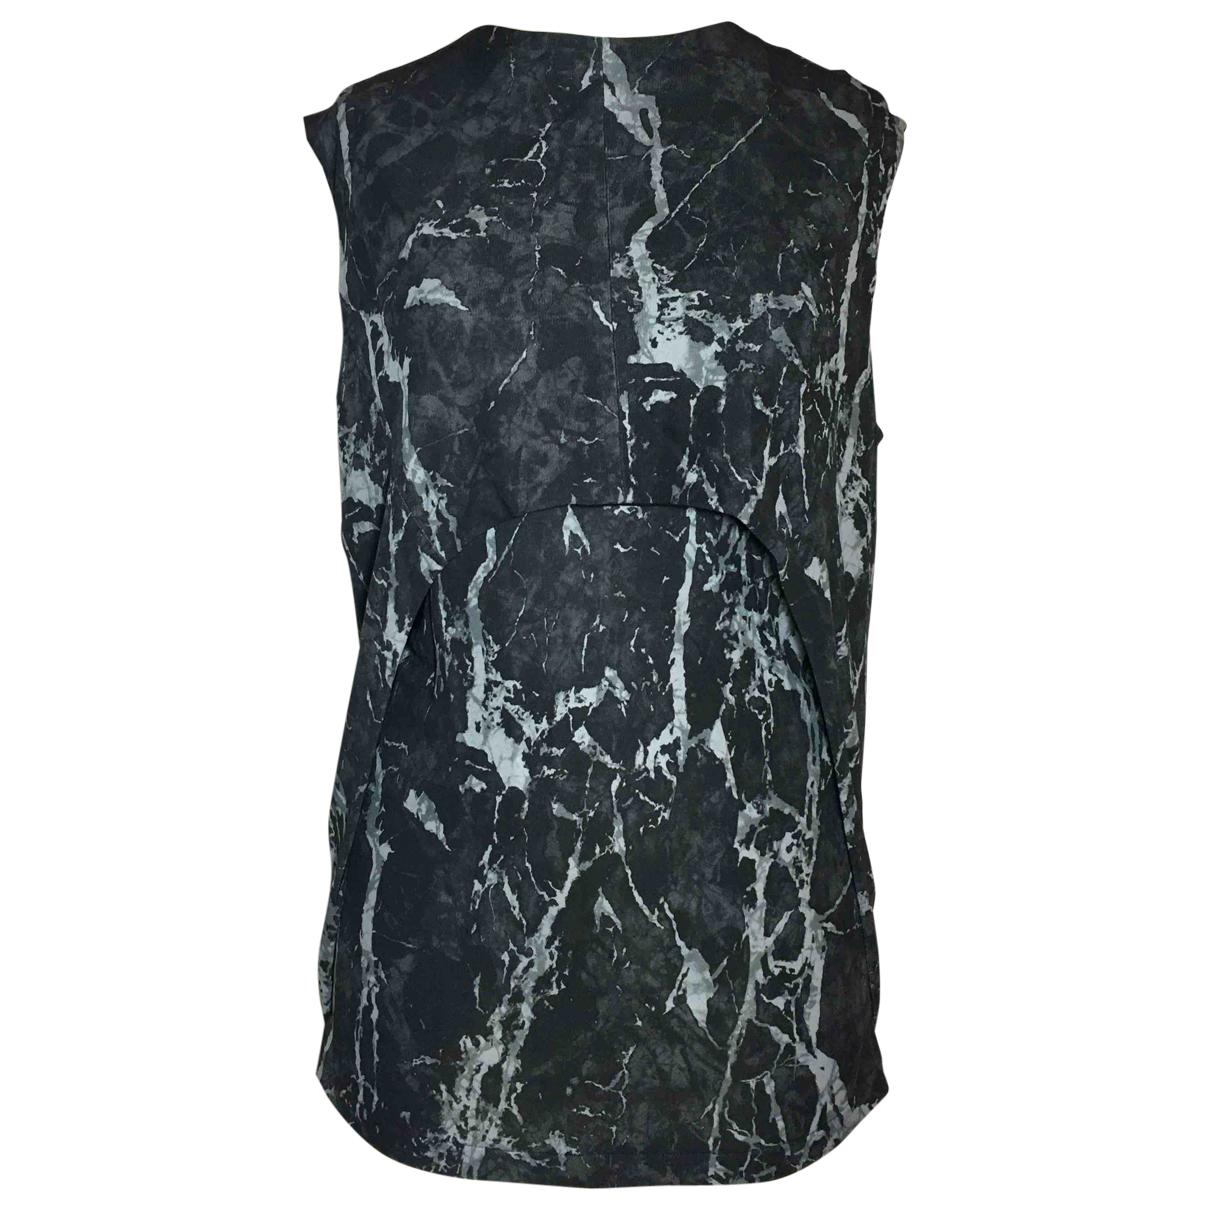 Balenciaga \N Anthracite  top for Women 40 FR